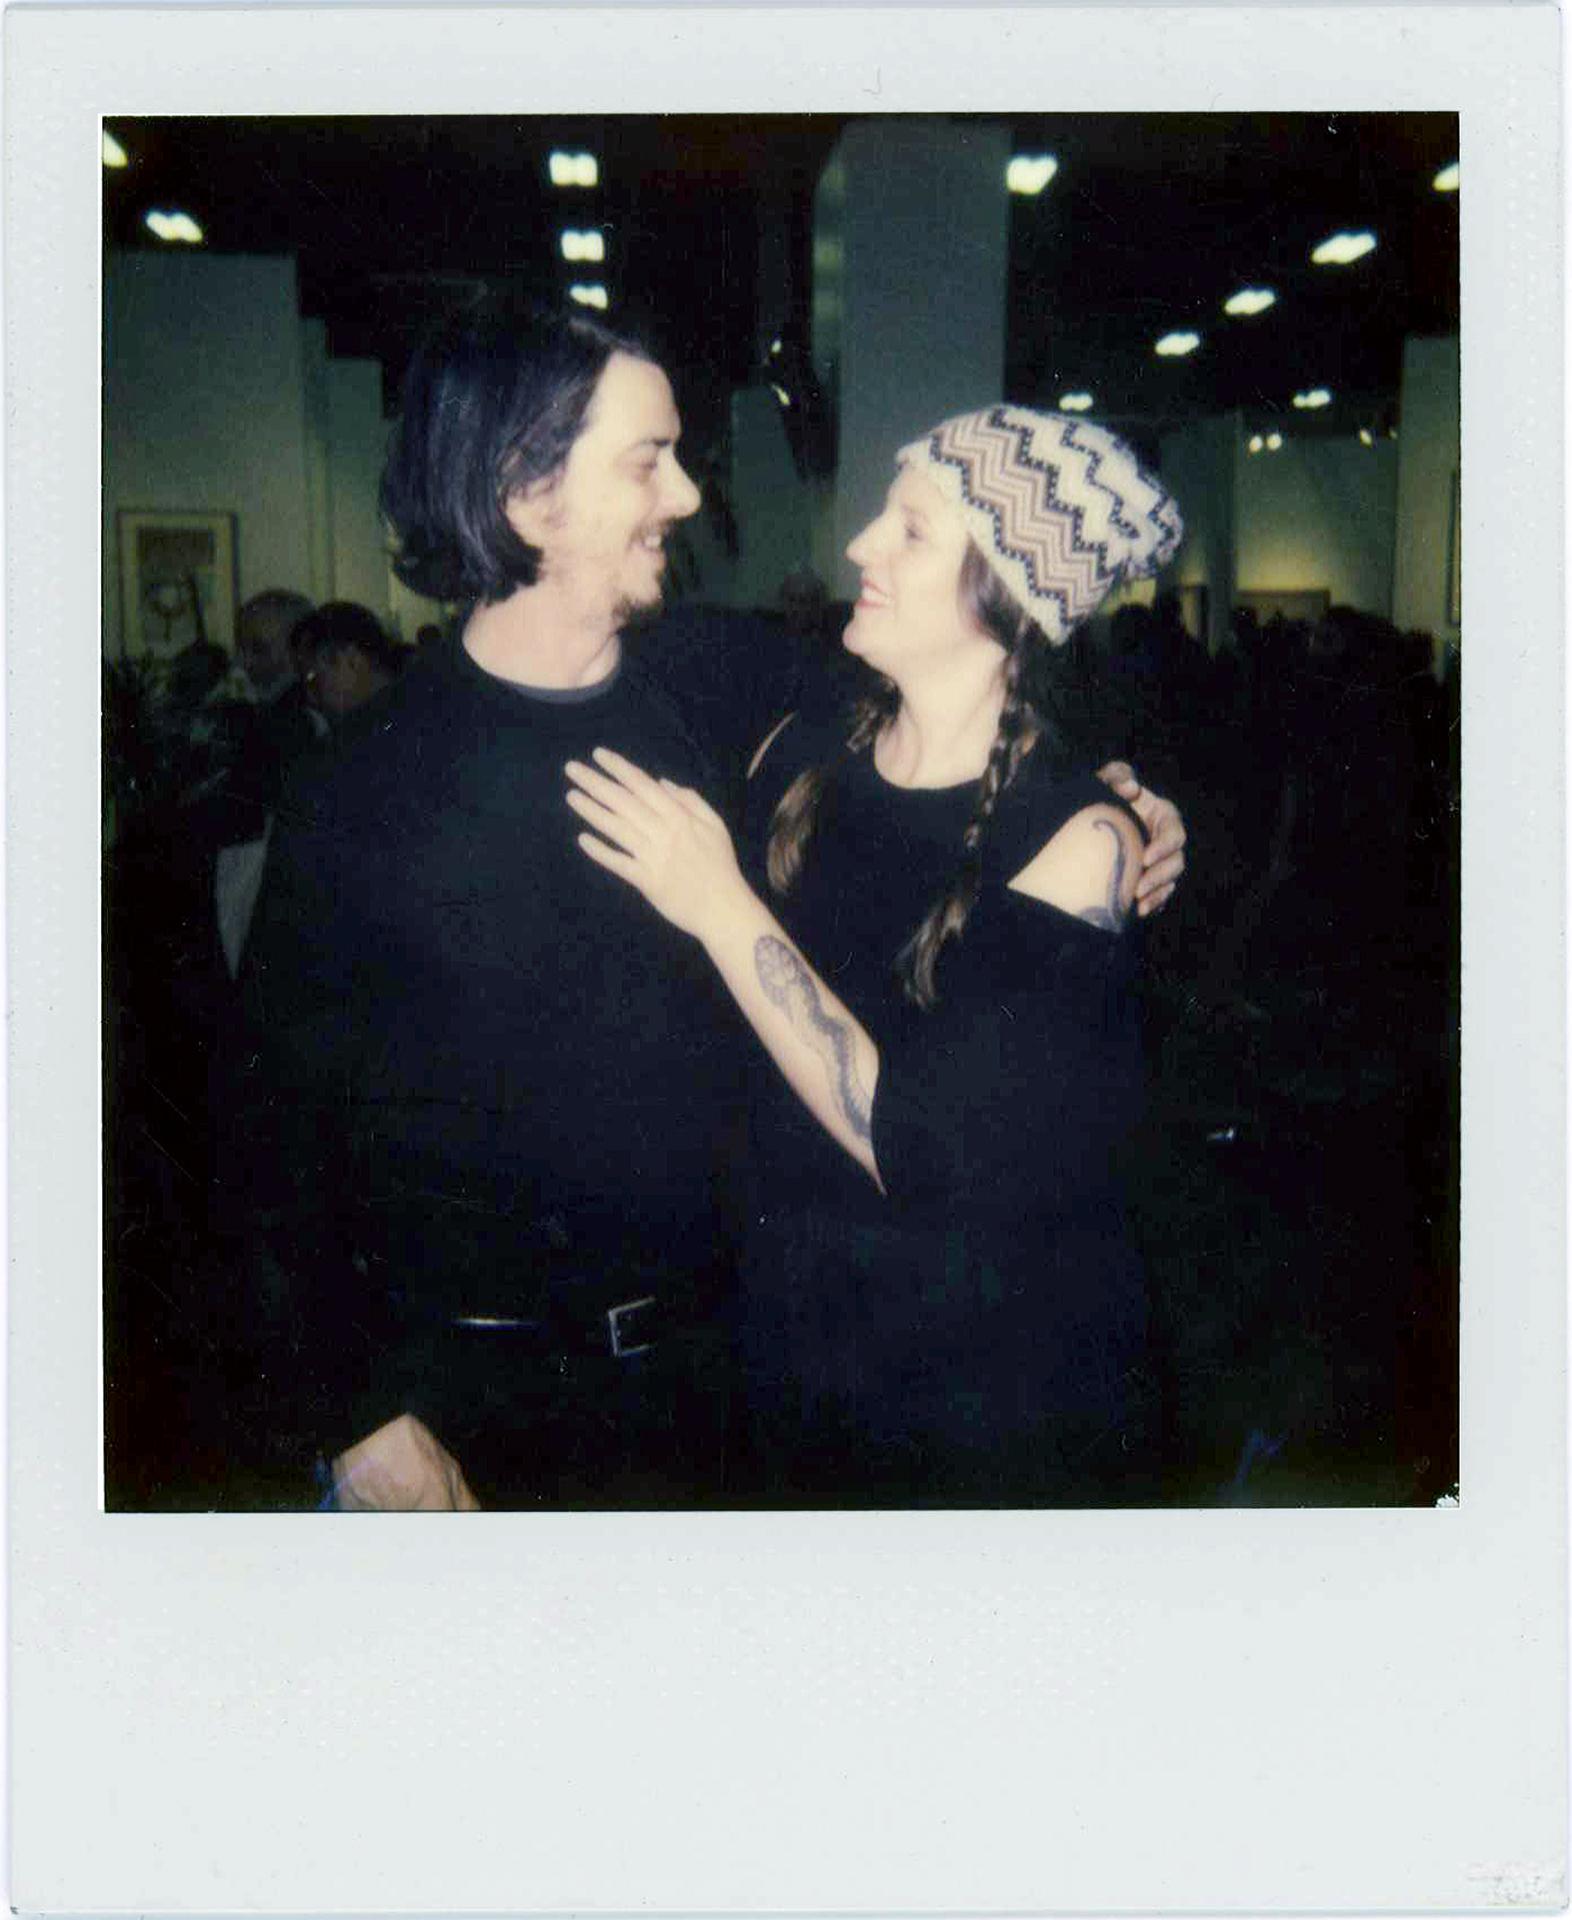 Joanne and Ray036.jpg